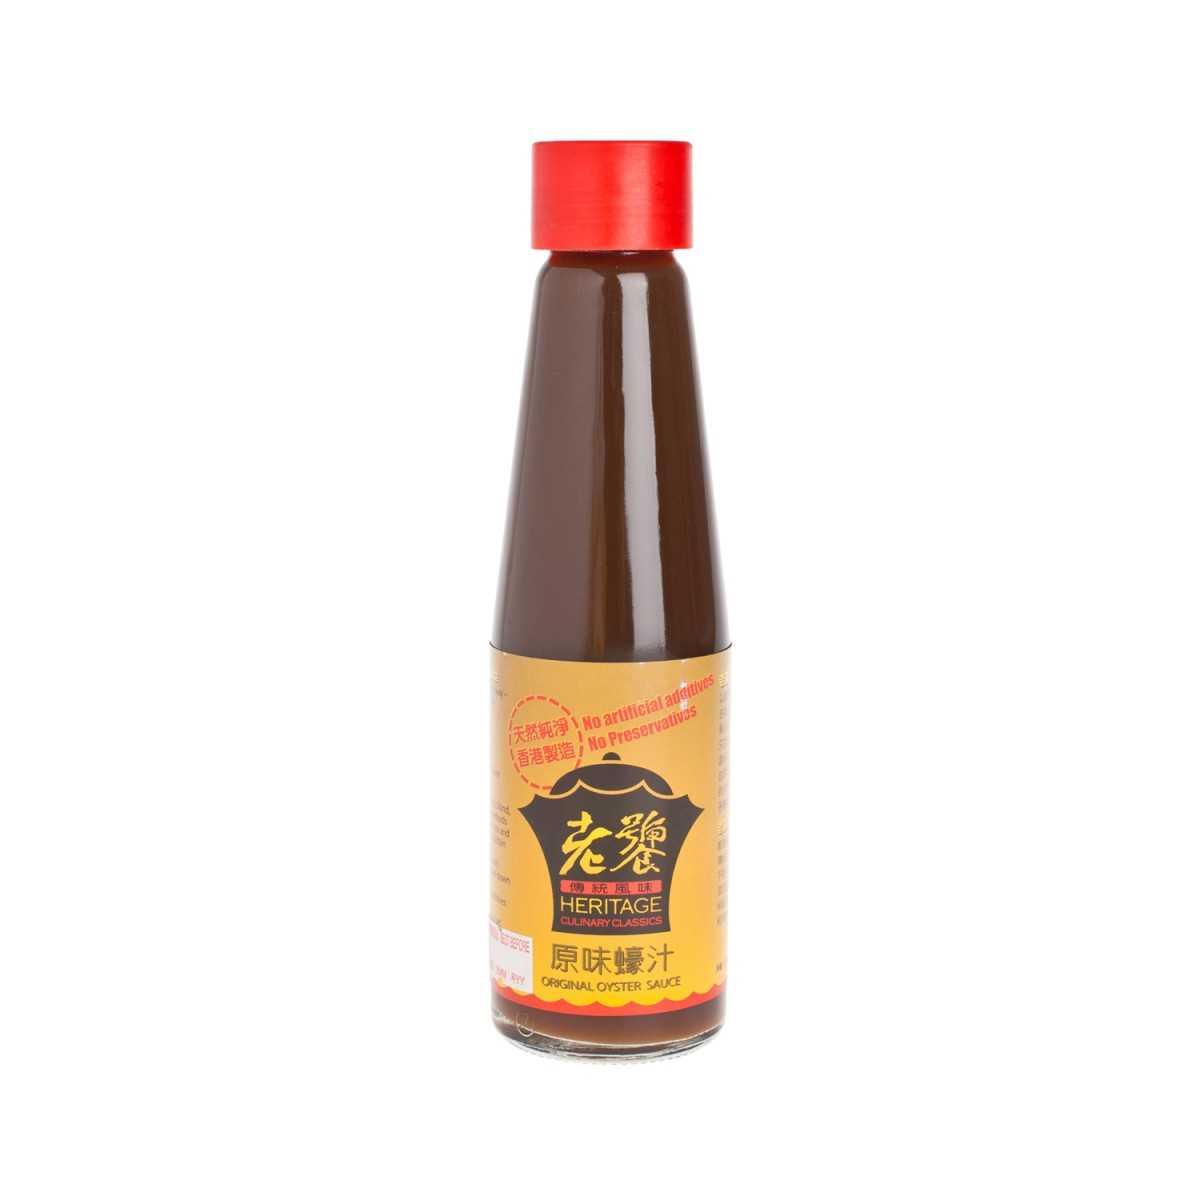 Heritage Original Oyster Sauce